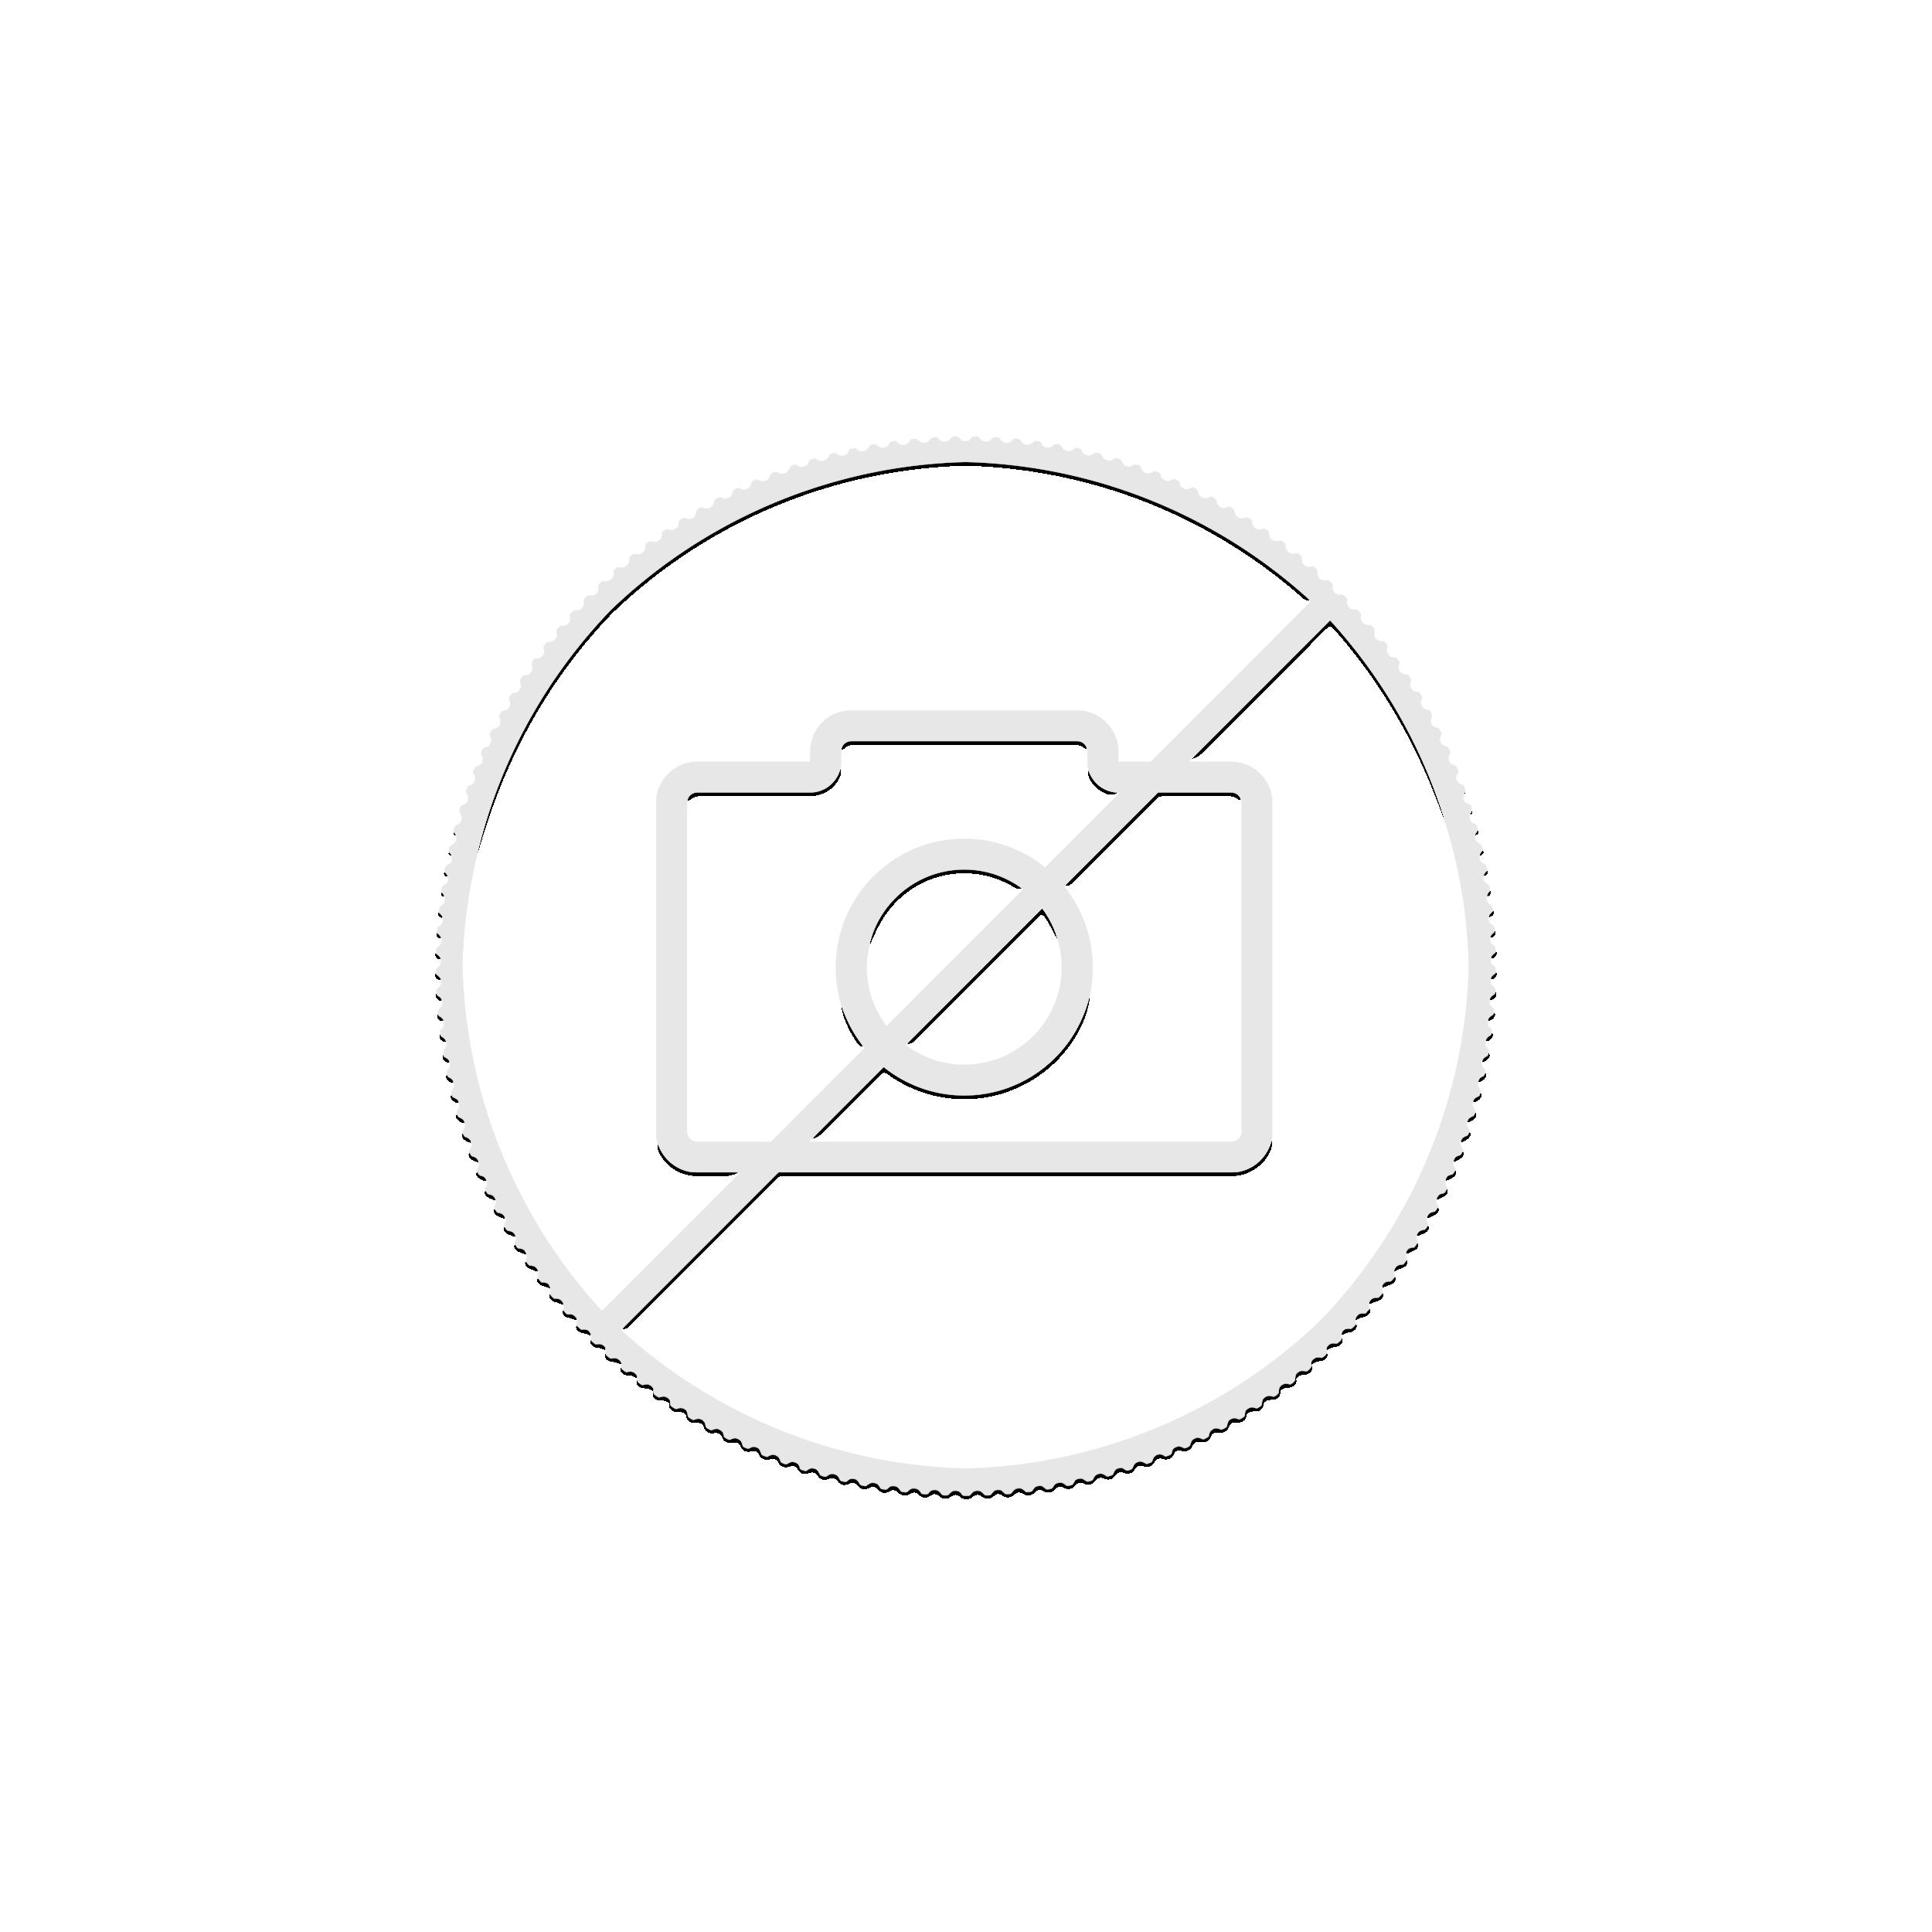 Gold bar 250 grams C. Hafner